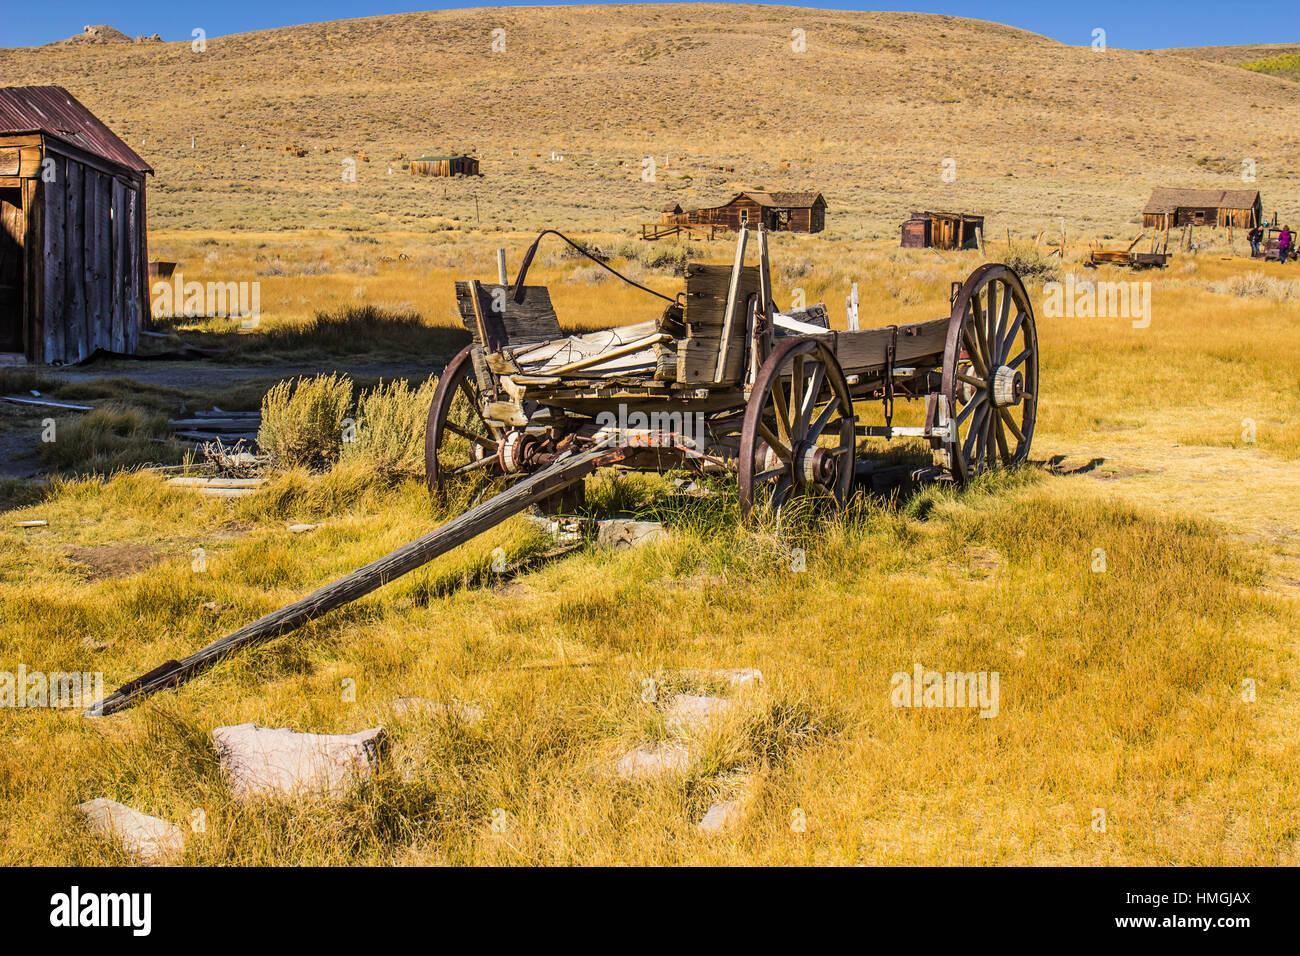 Vintage Wood Wagon Abandoned In High Desert - Stock Image